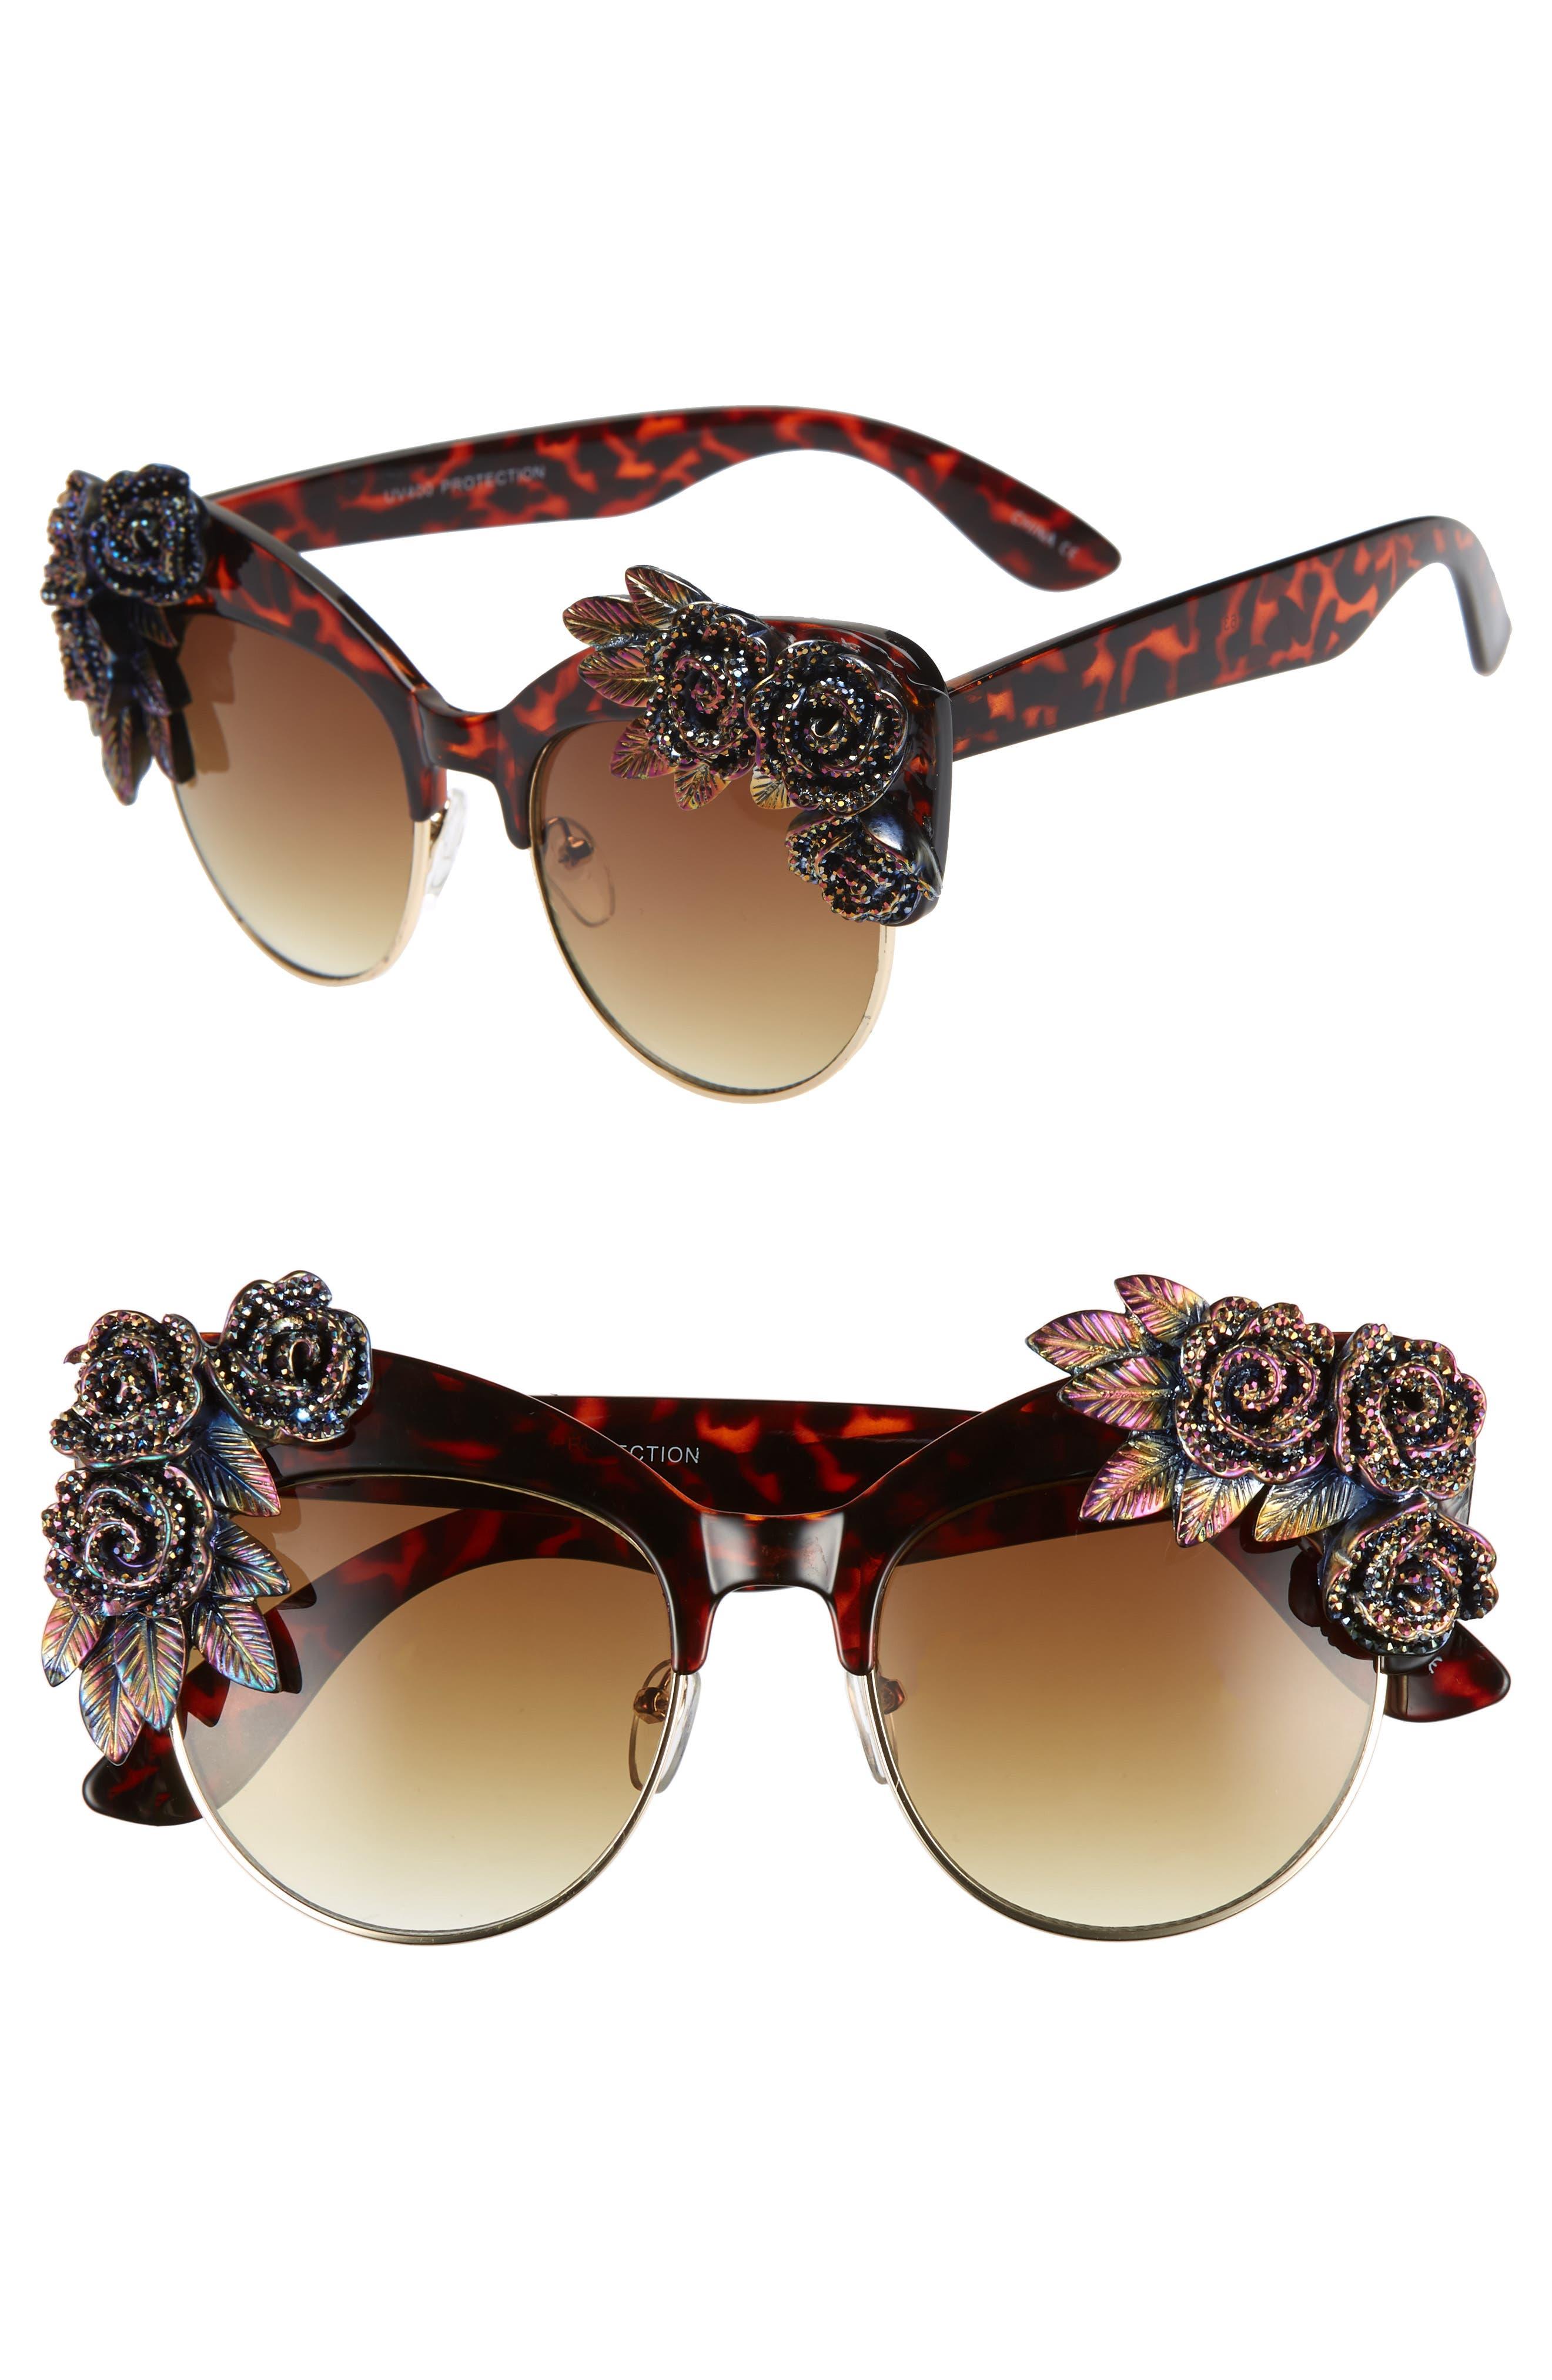 Rad + Refined Flower Cat Eye Sunglasses - Tort/ Multi